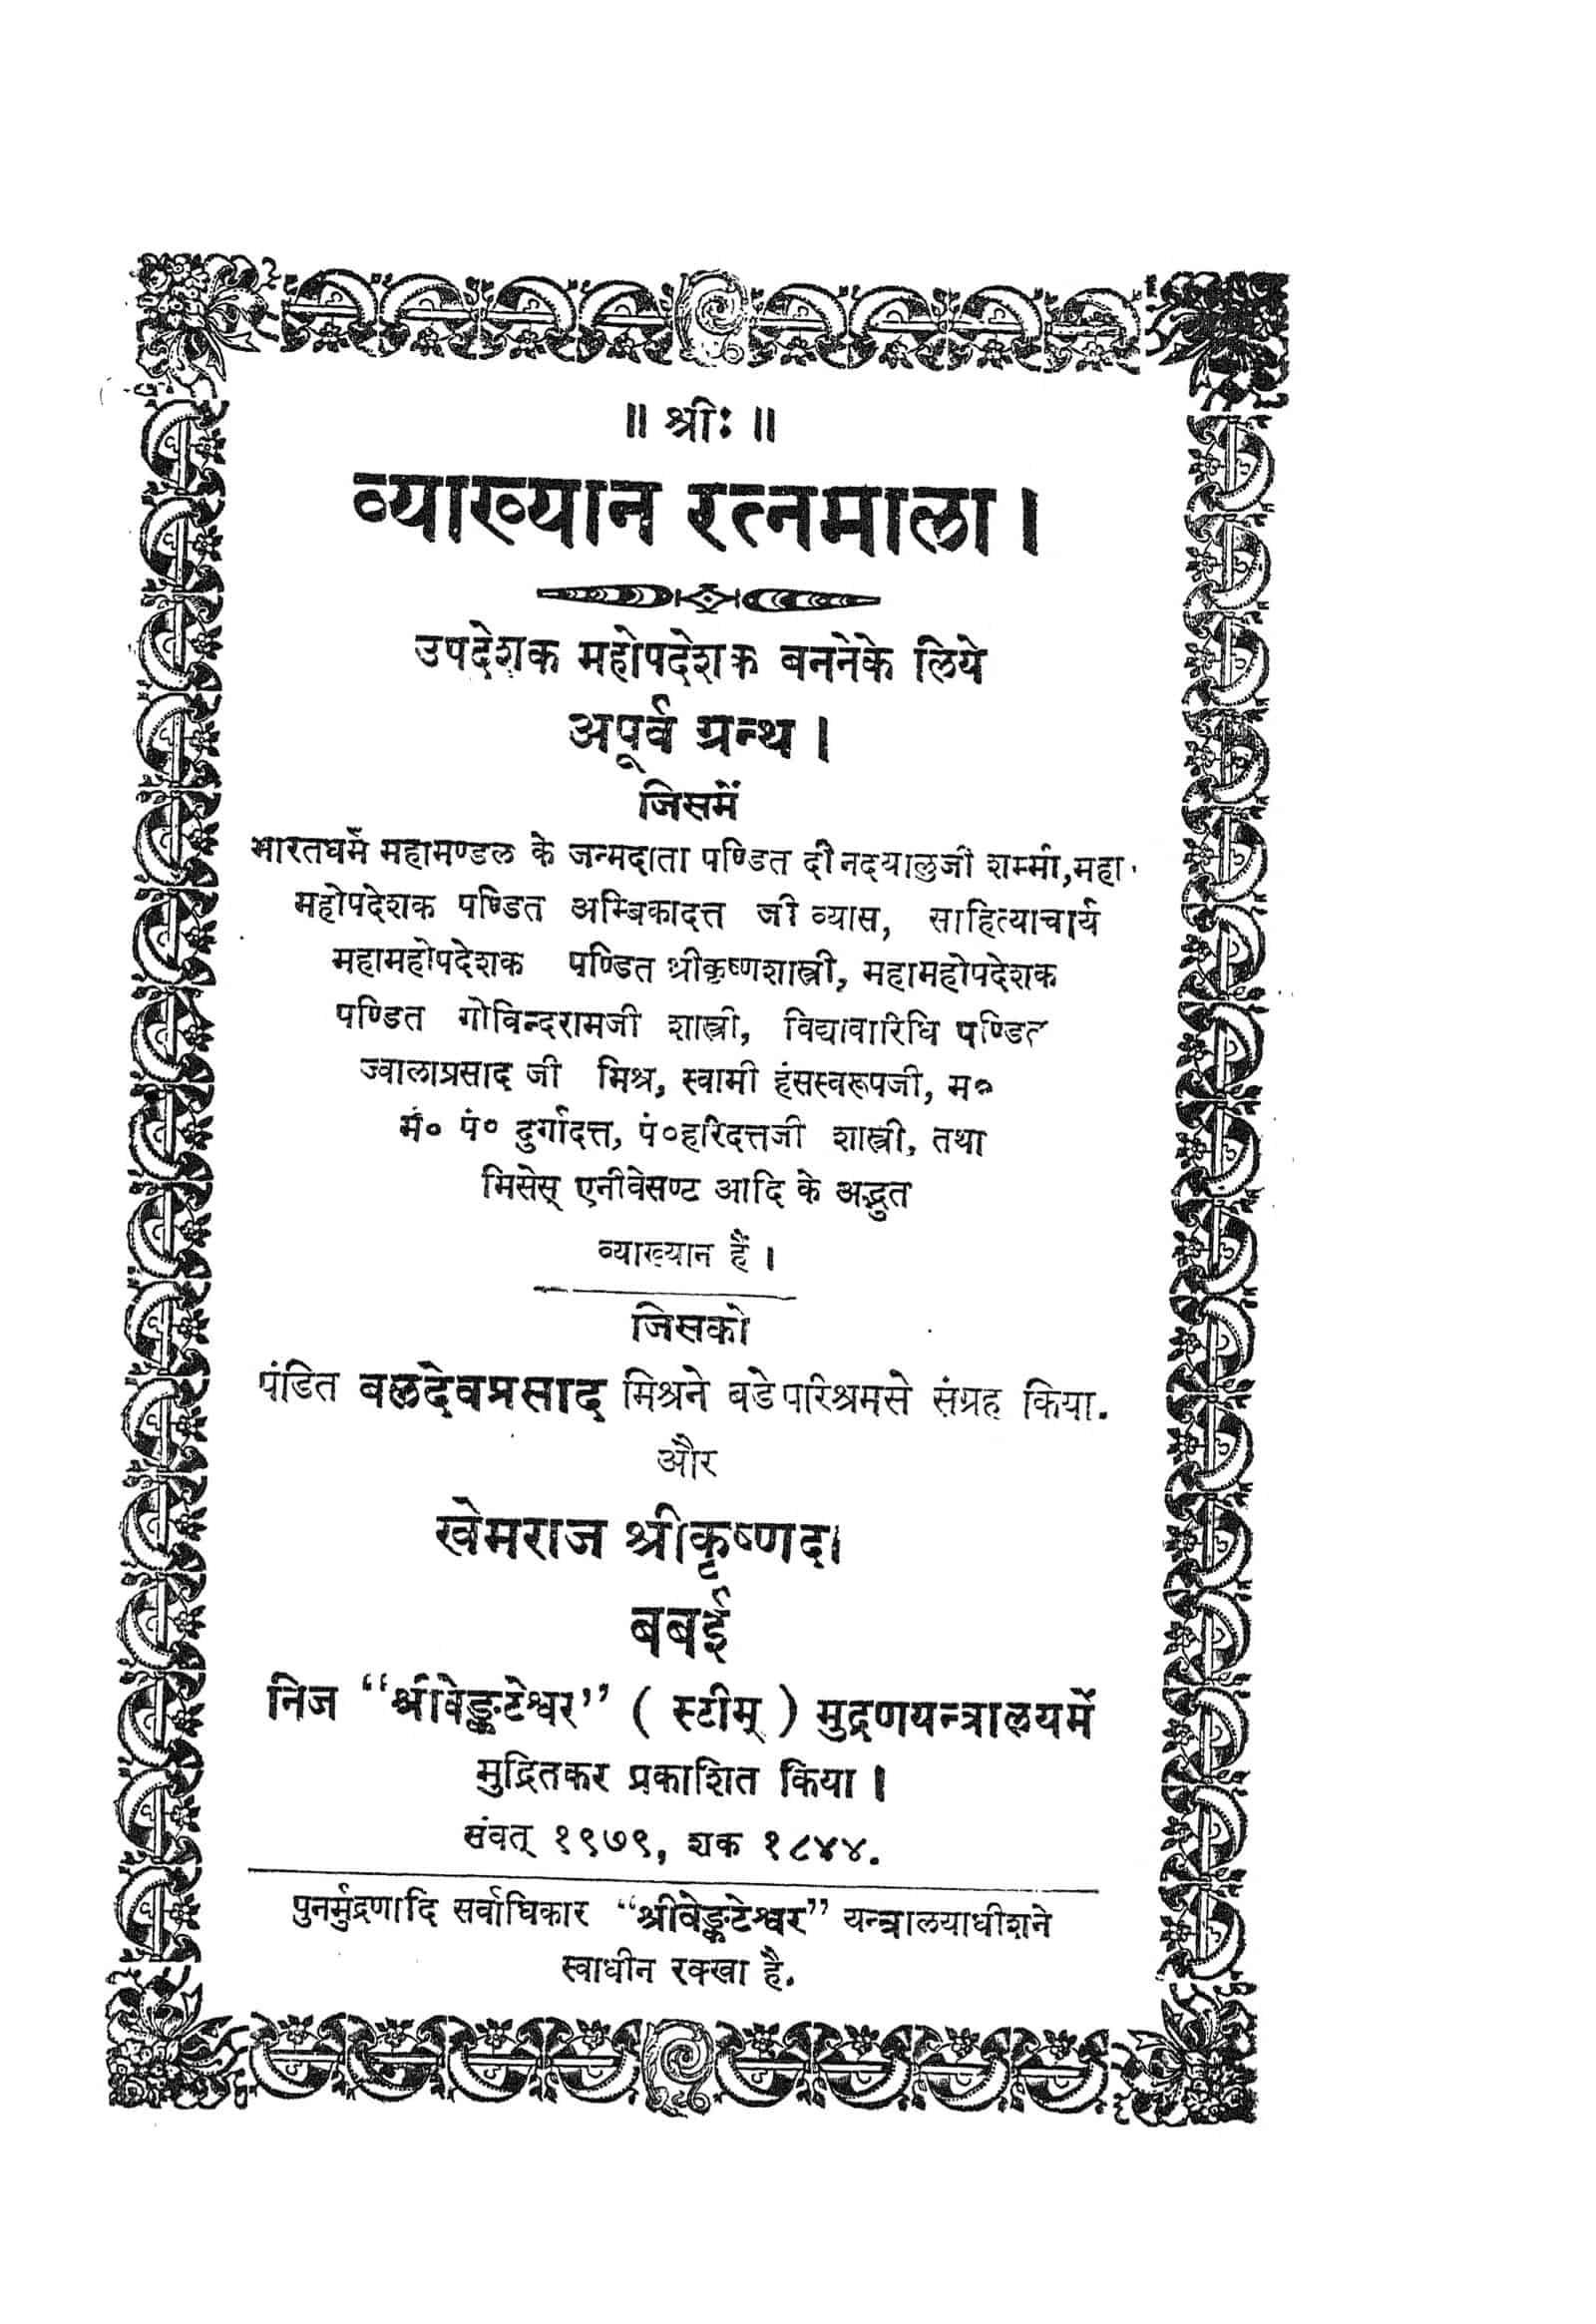 Book Image : श्री व्याख्यान रत्नमाला - Shri Vyakhyan Ratnamala